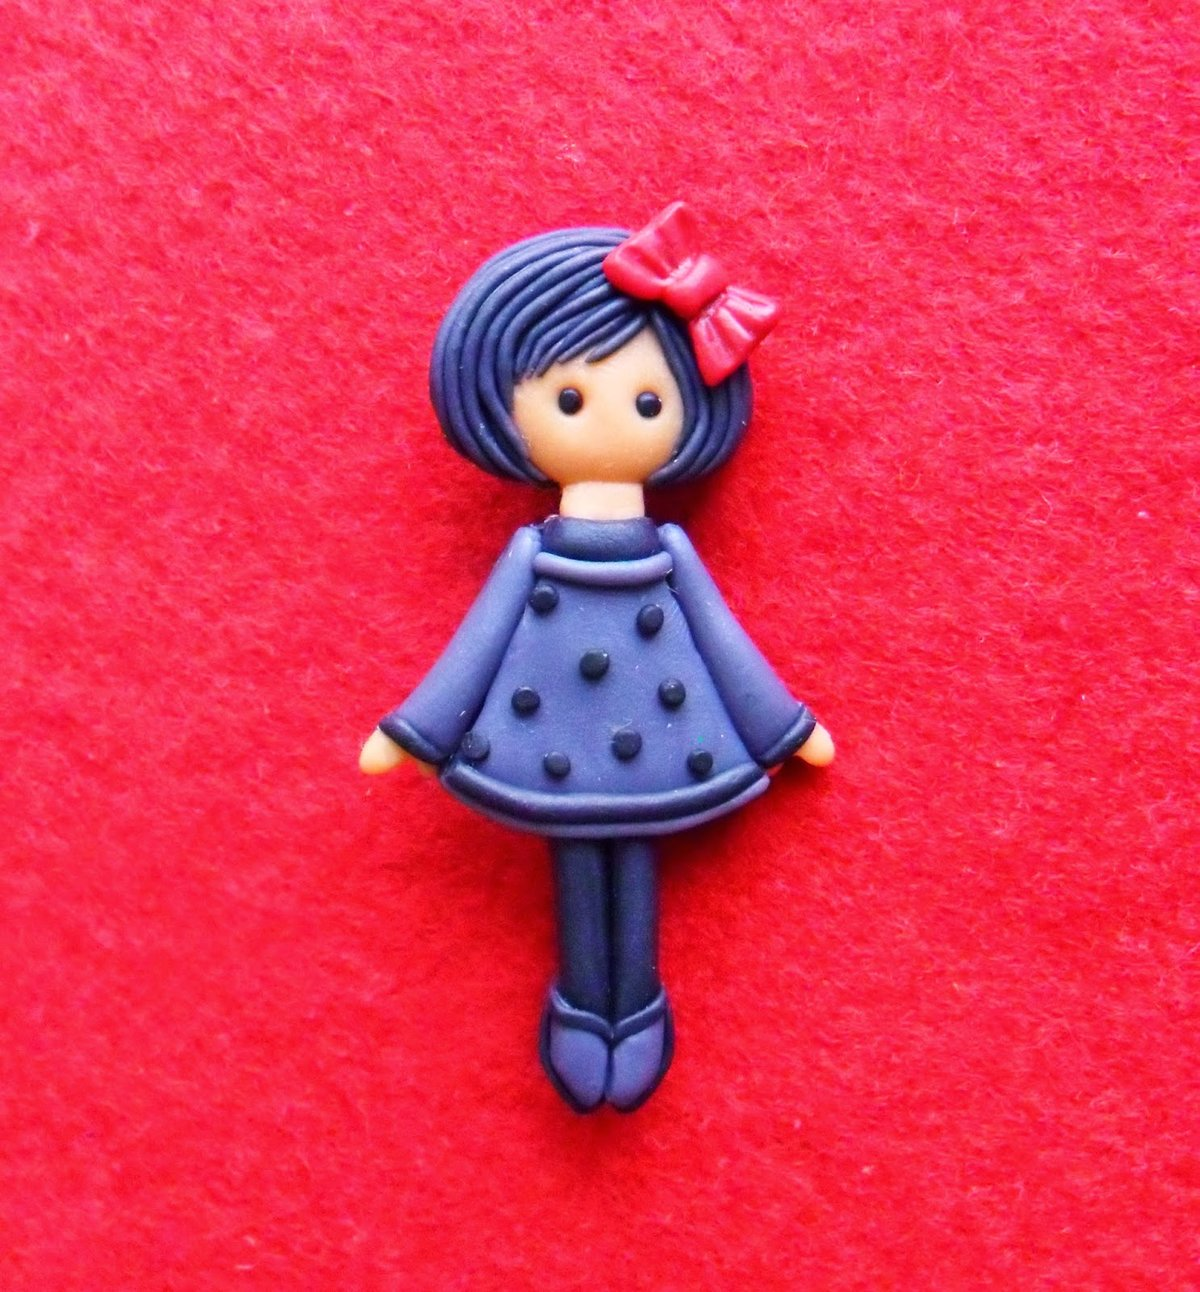 кукла из пластилина своими руками ценами